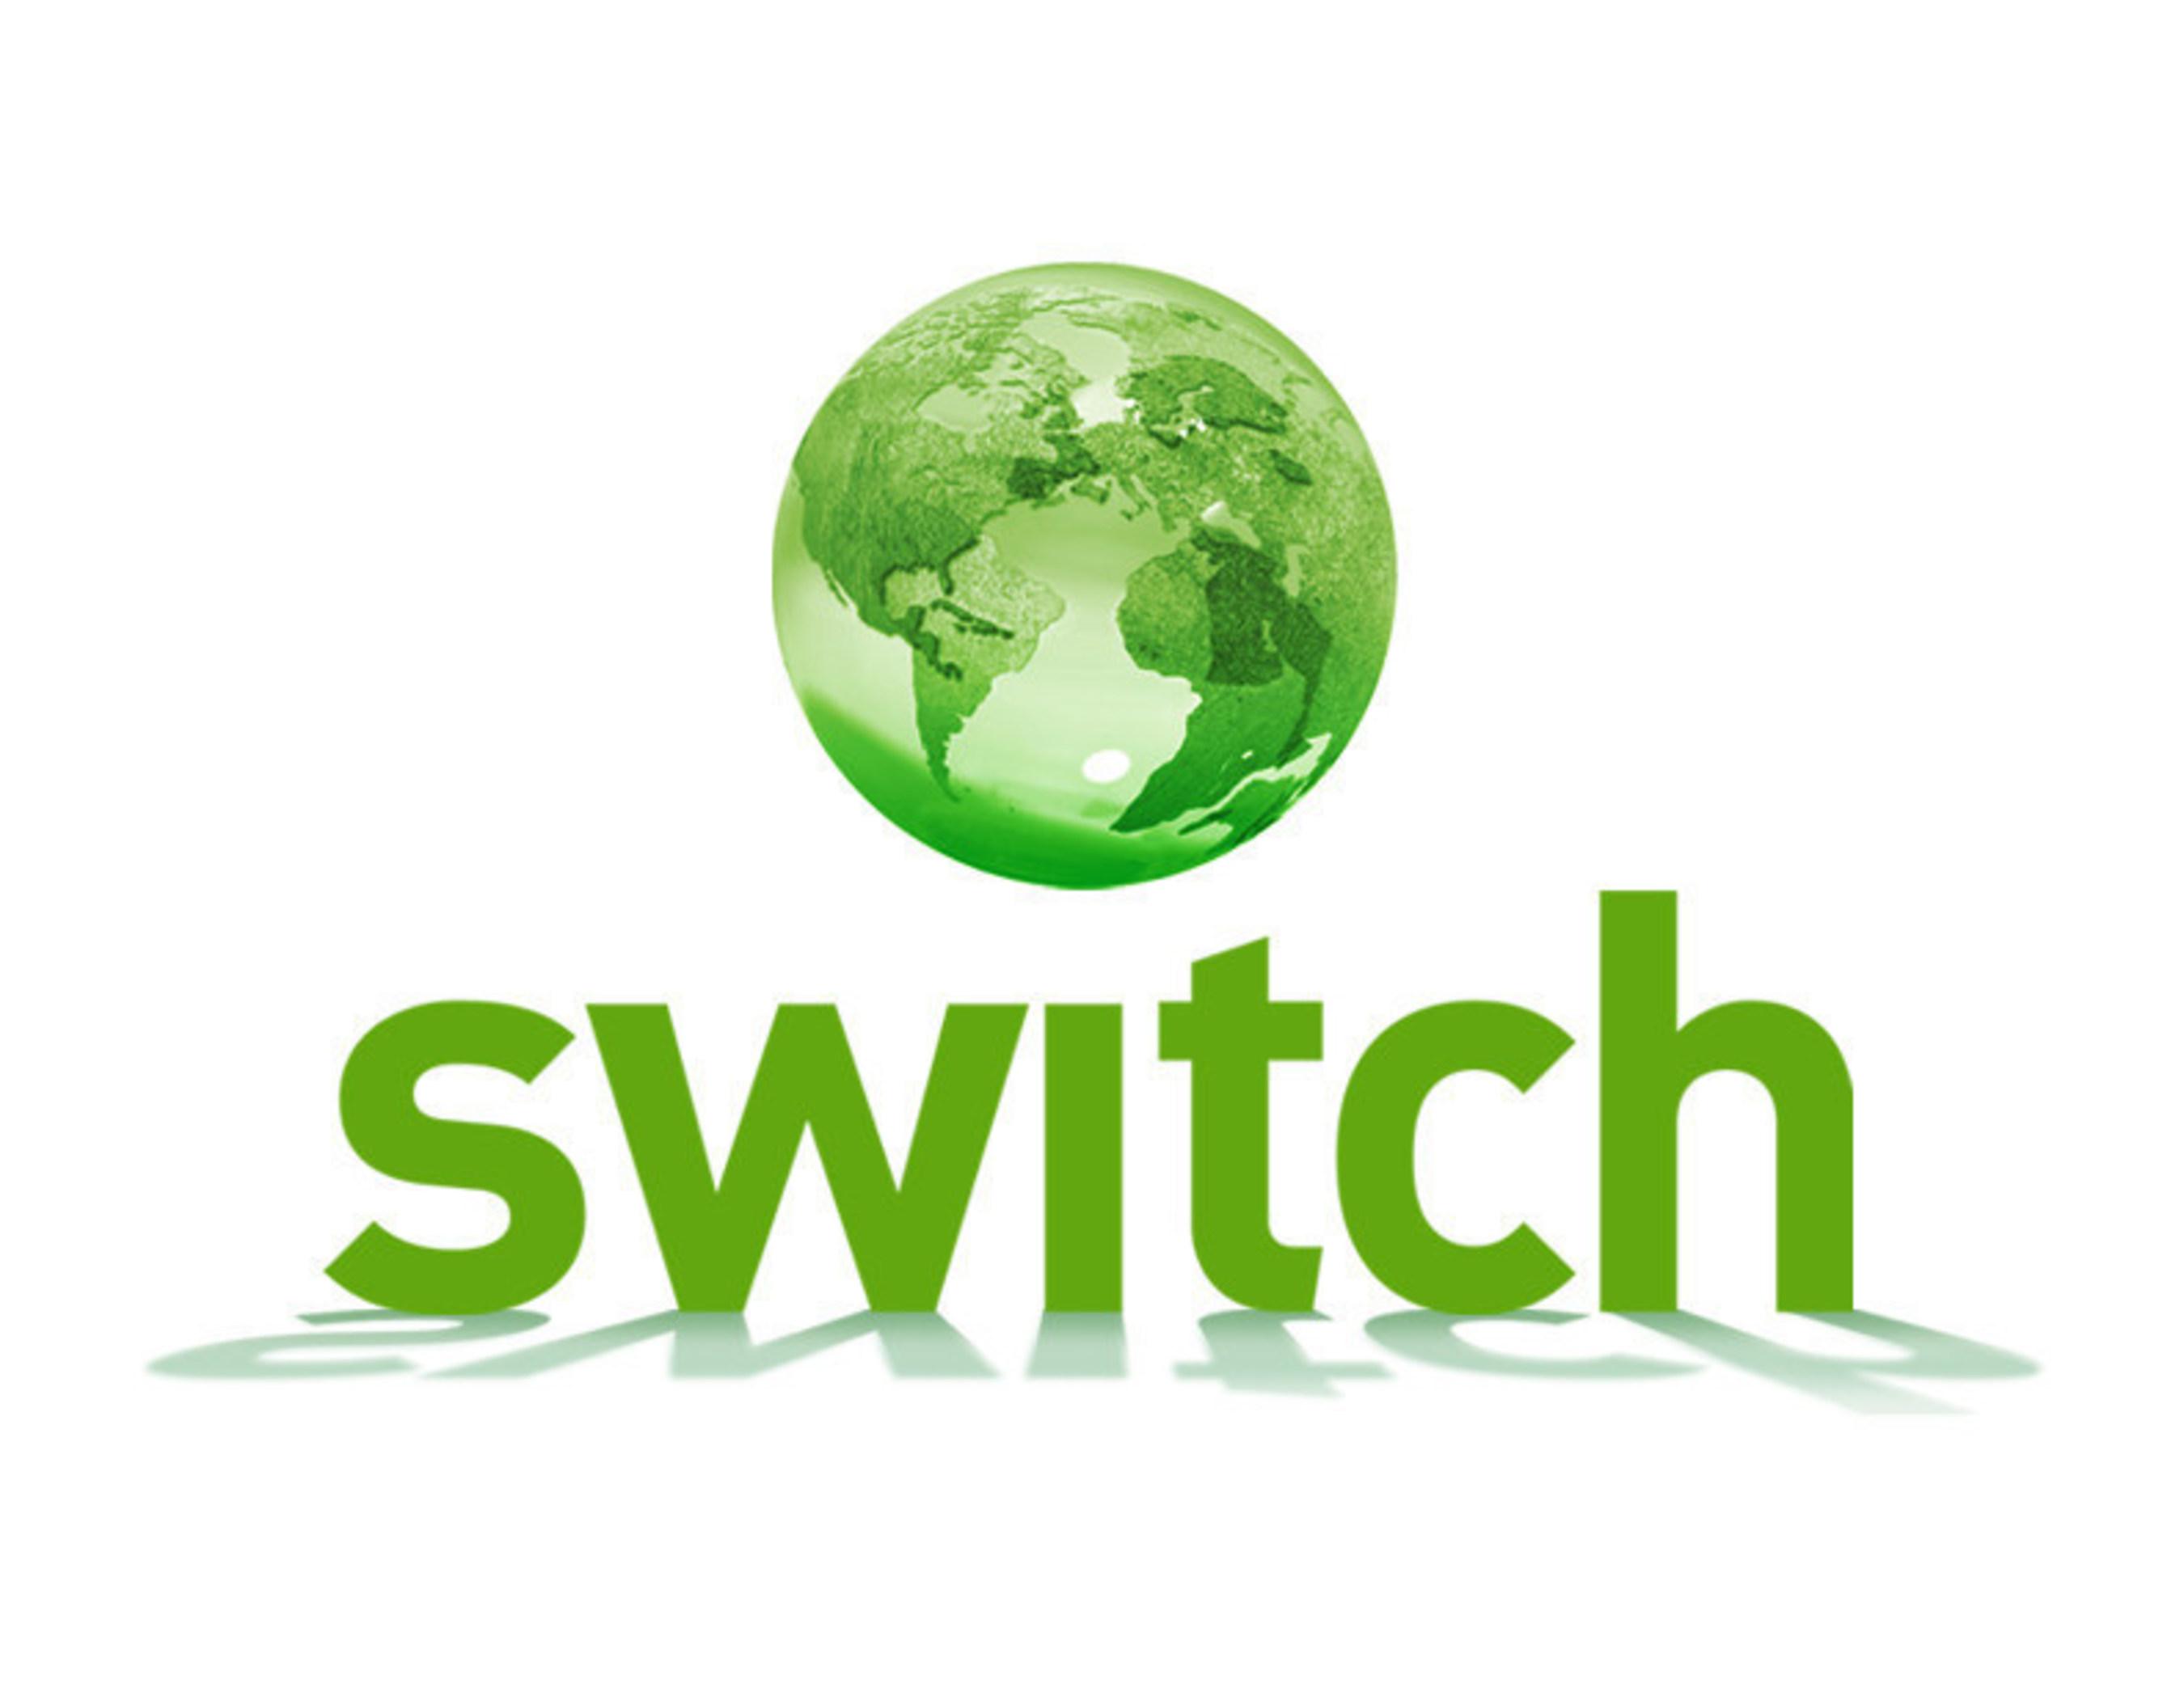 Switch green technology logo